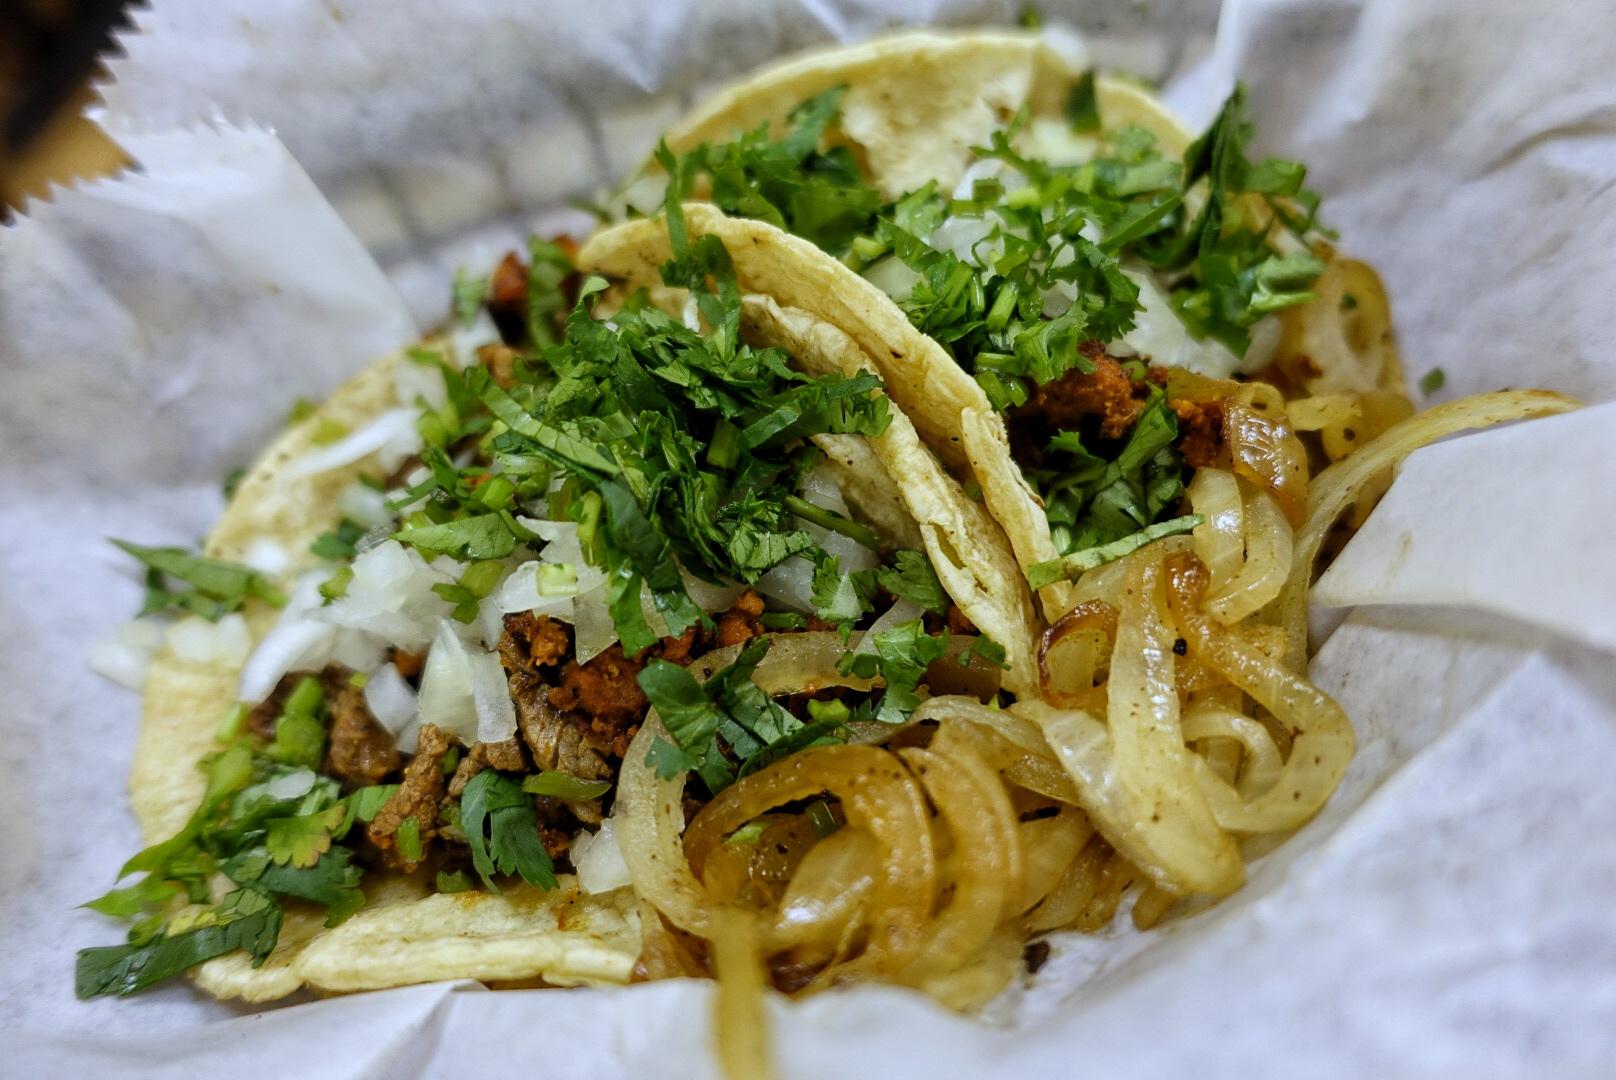 The tacos campechano.